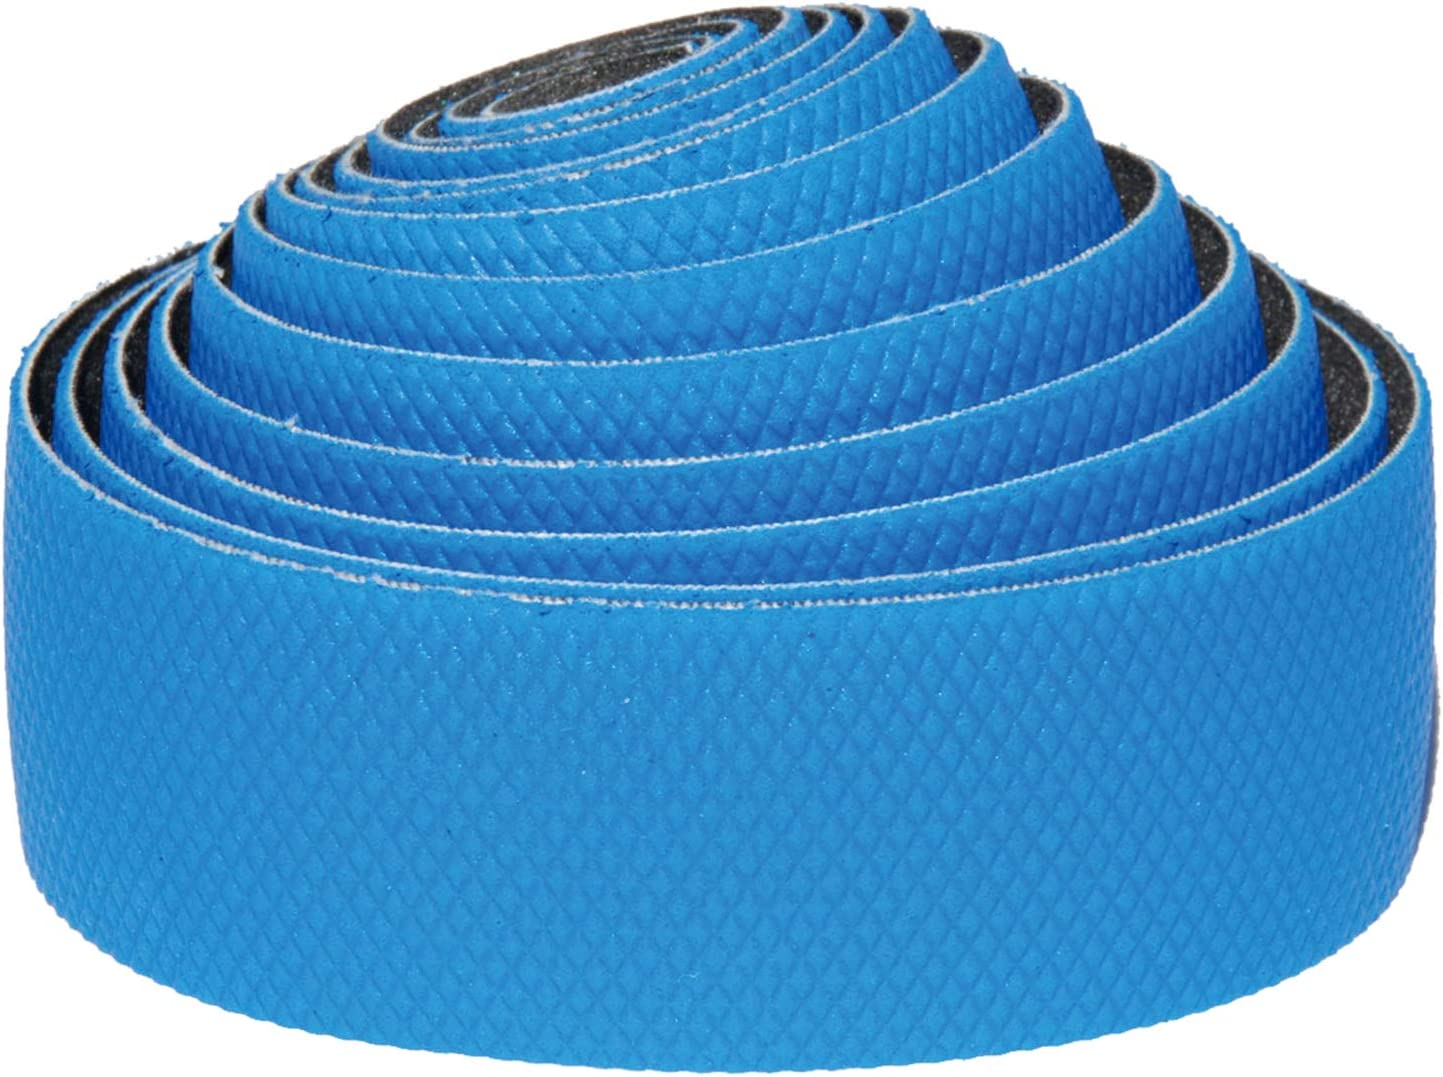 blau Handlebar Tape standard size Bike Ribbon Unisex/_Adult BikeRibbon Lenkerband GRIP EVO Blue